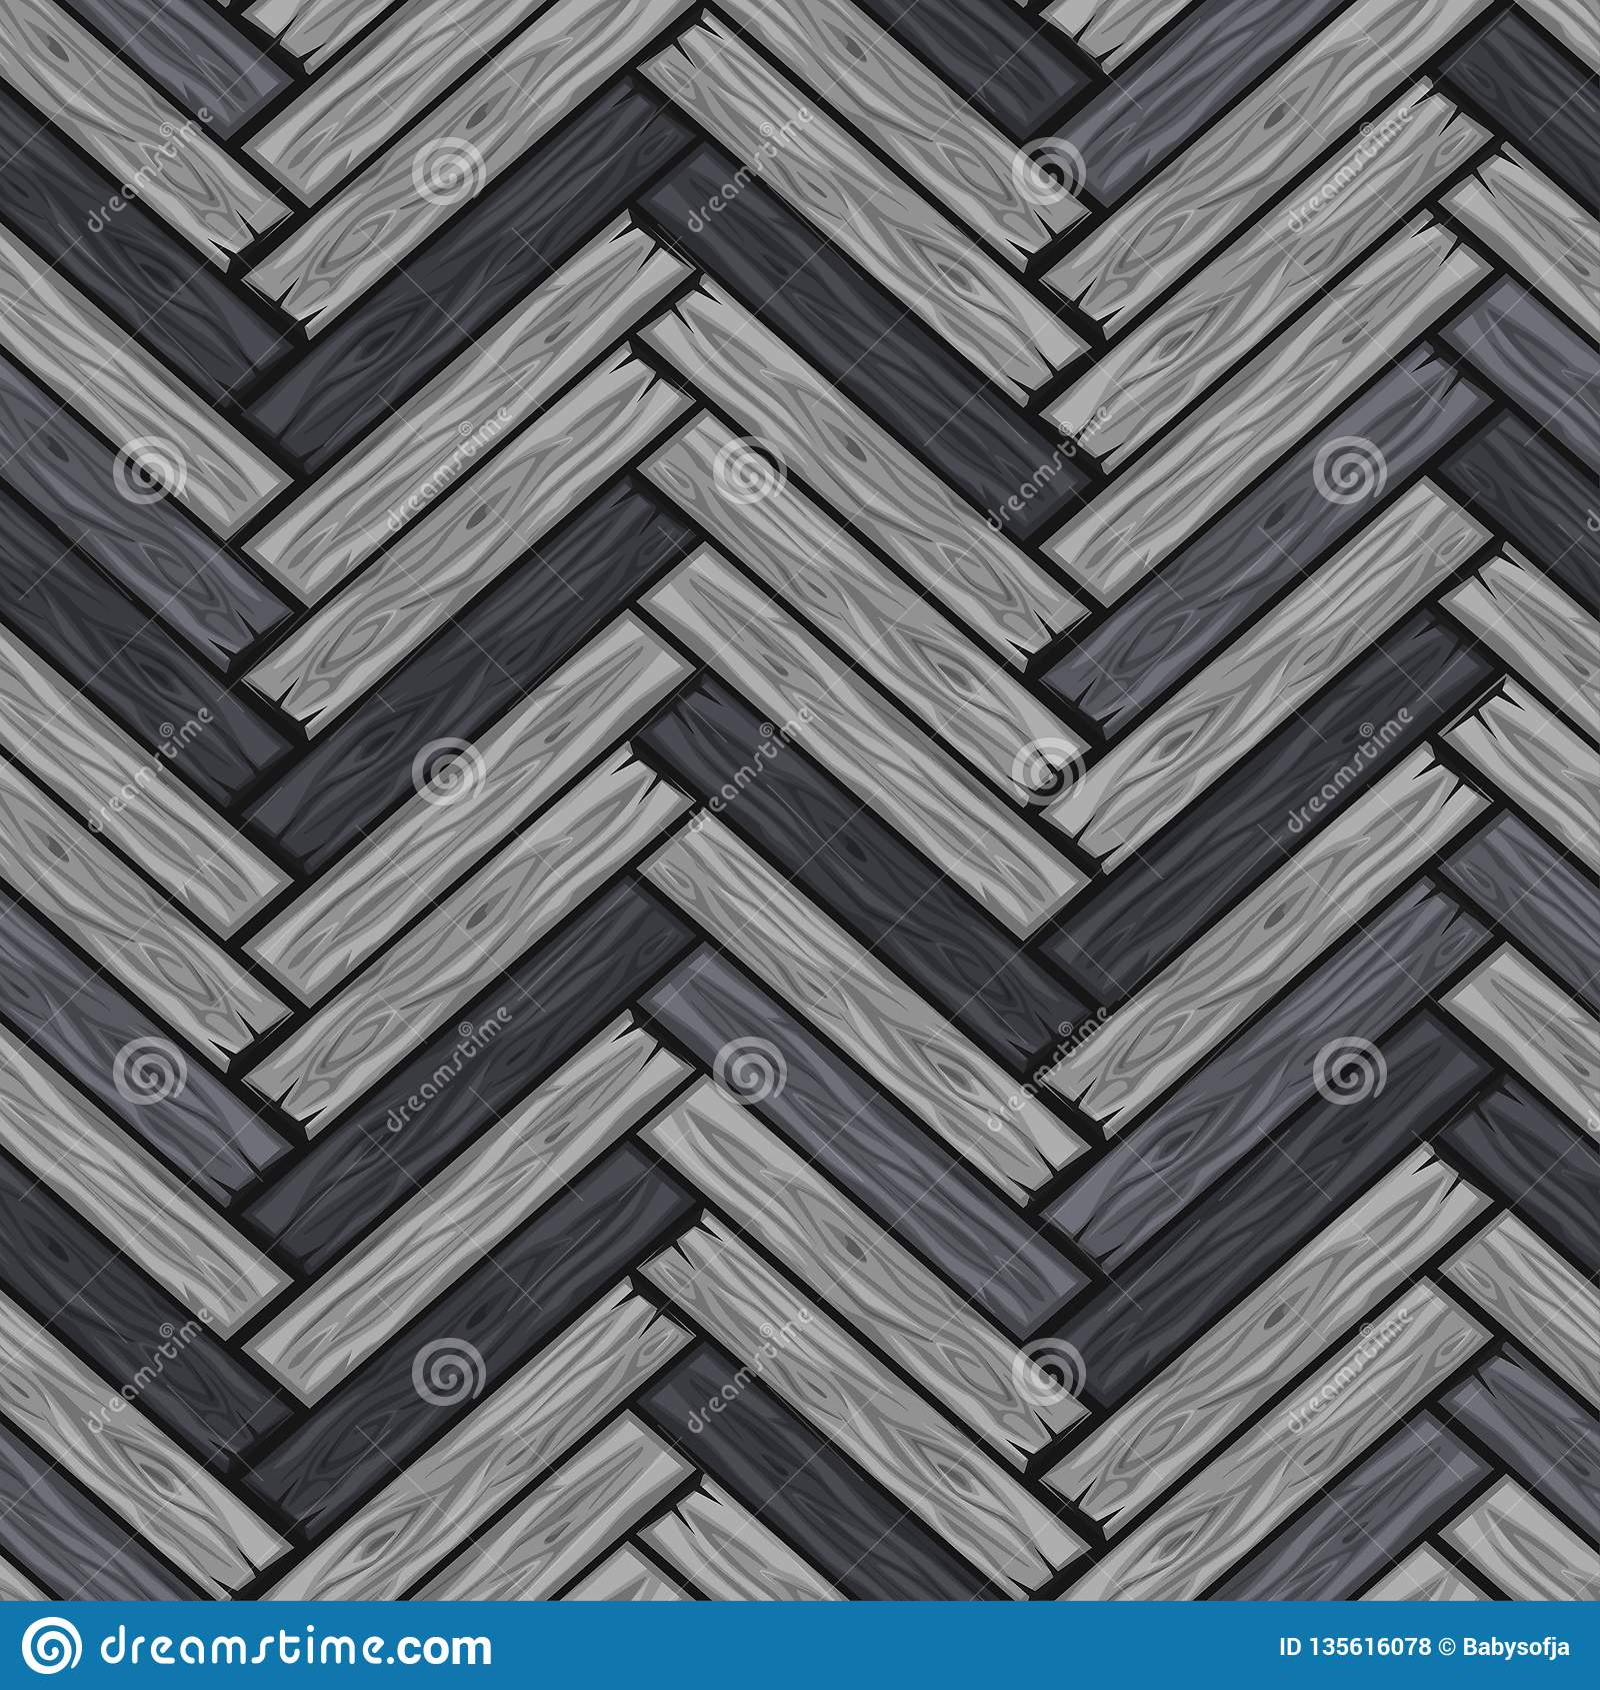 https www dreamstime com cartoonwood herringbone tiles pattern seamless texture grey wooden parquet board vector illustration user interface image135616078